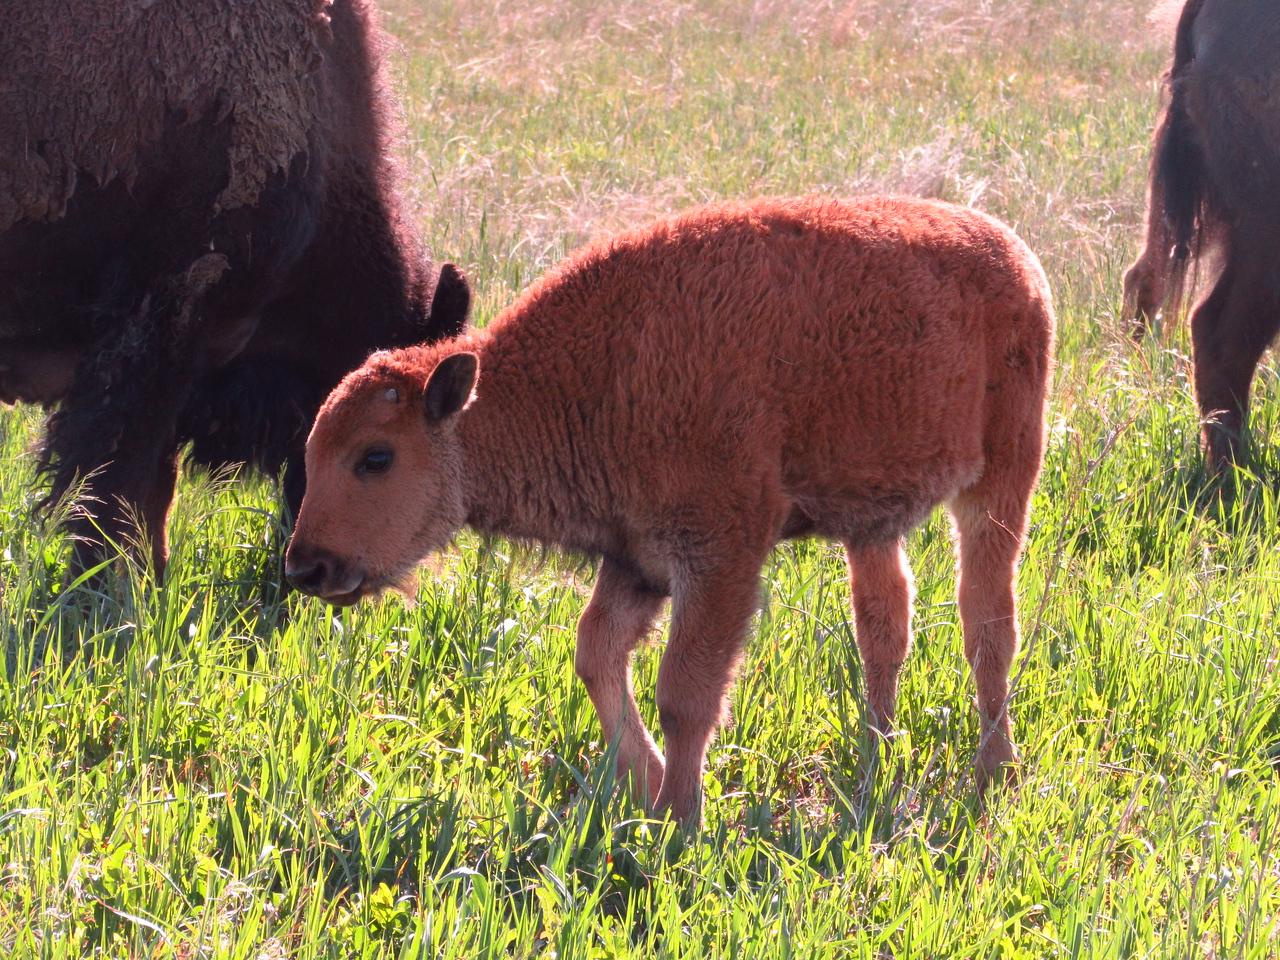 Bison calf, spring 2014. PHOTO BY RACHEL HERRING